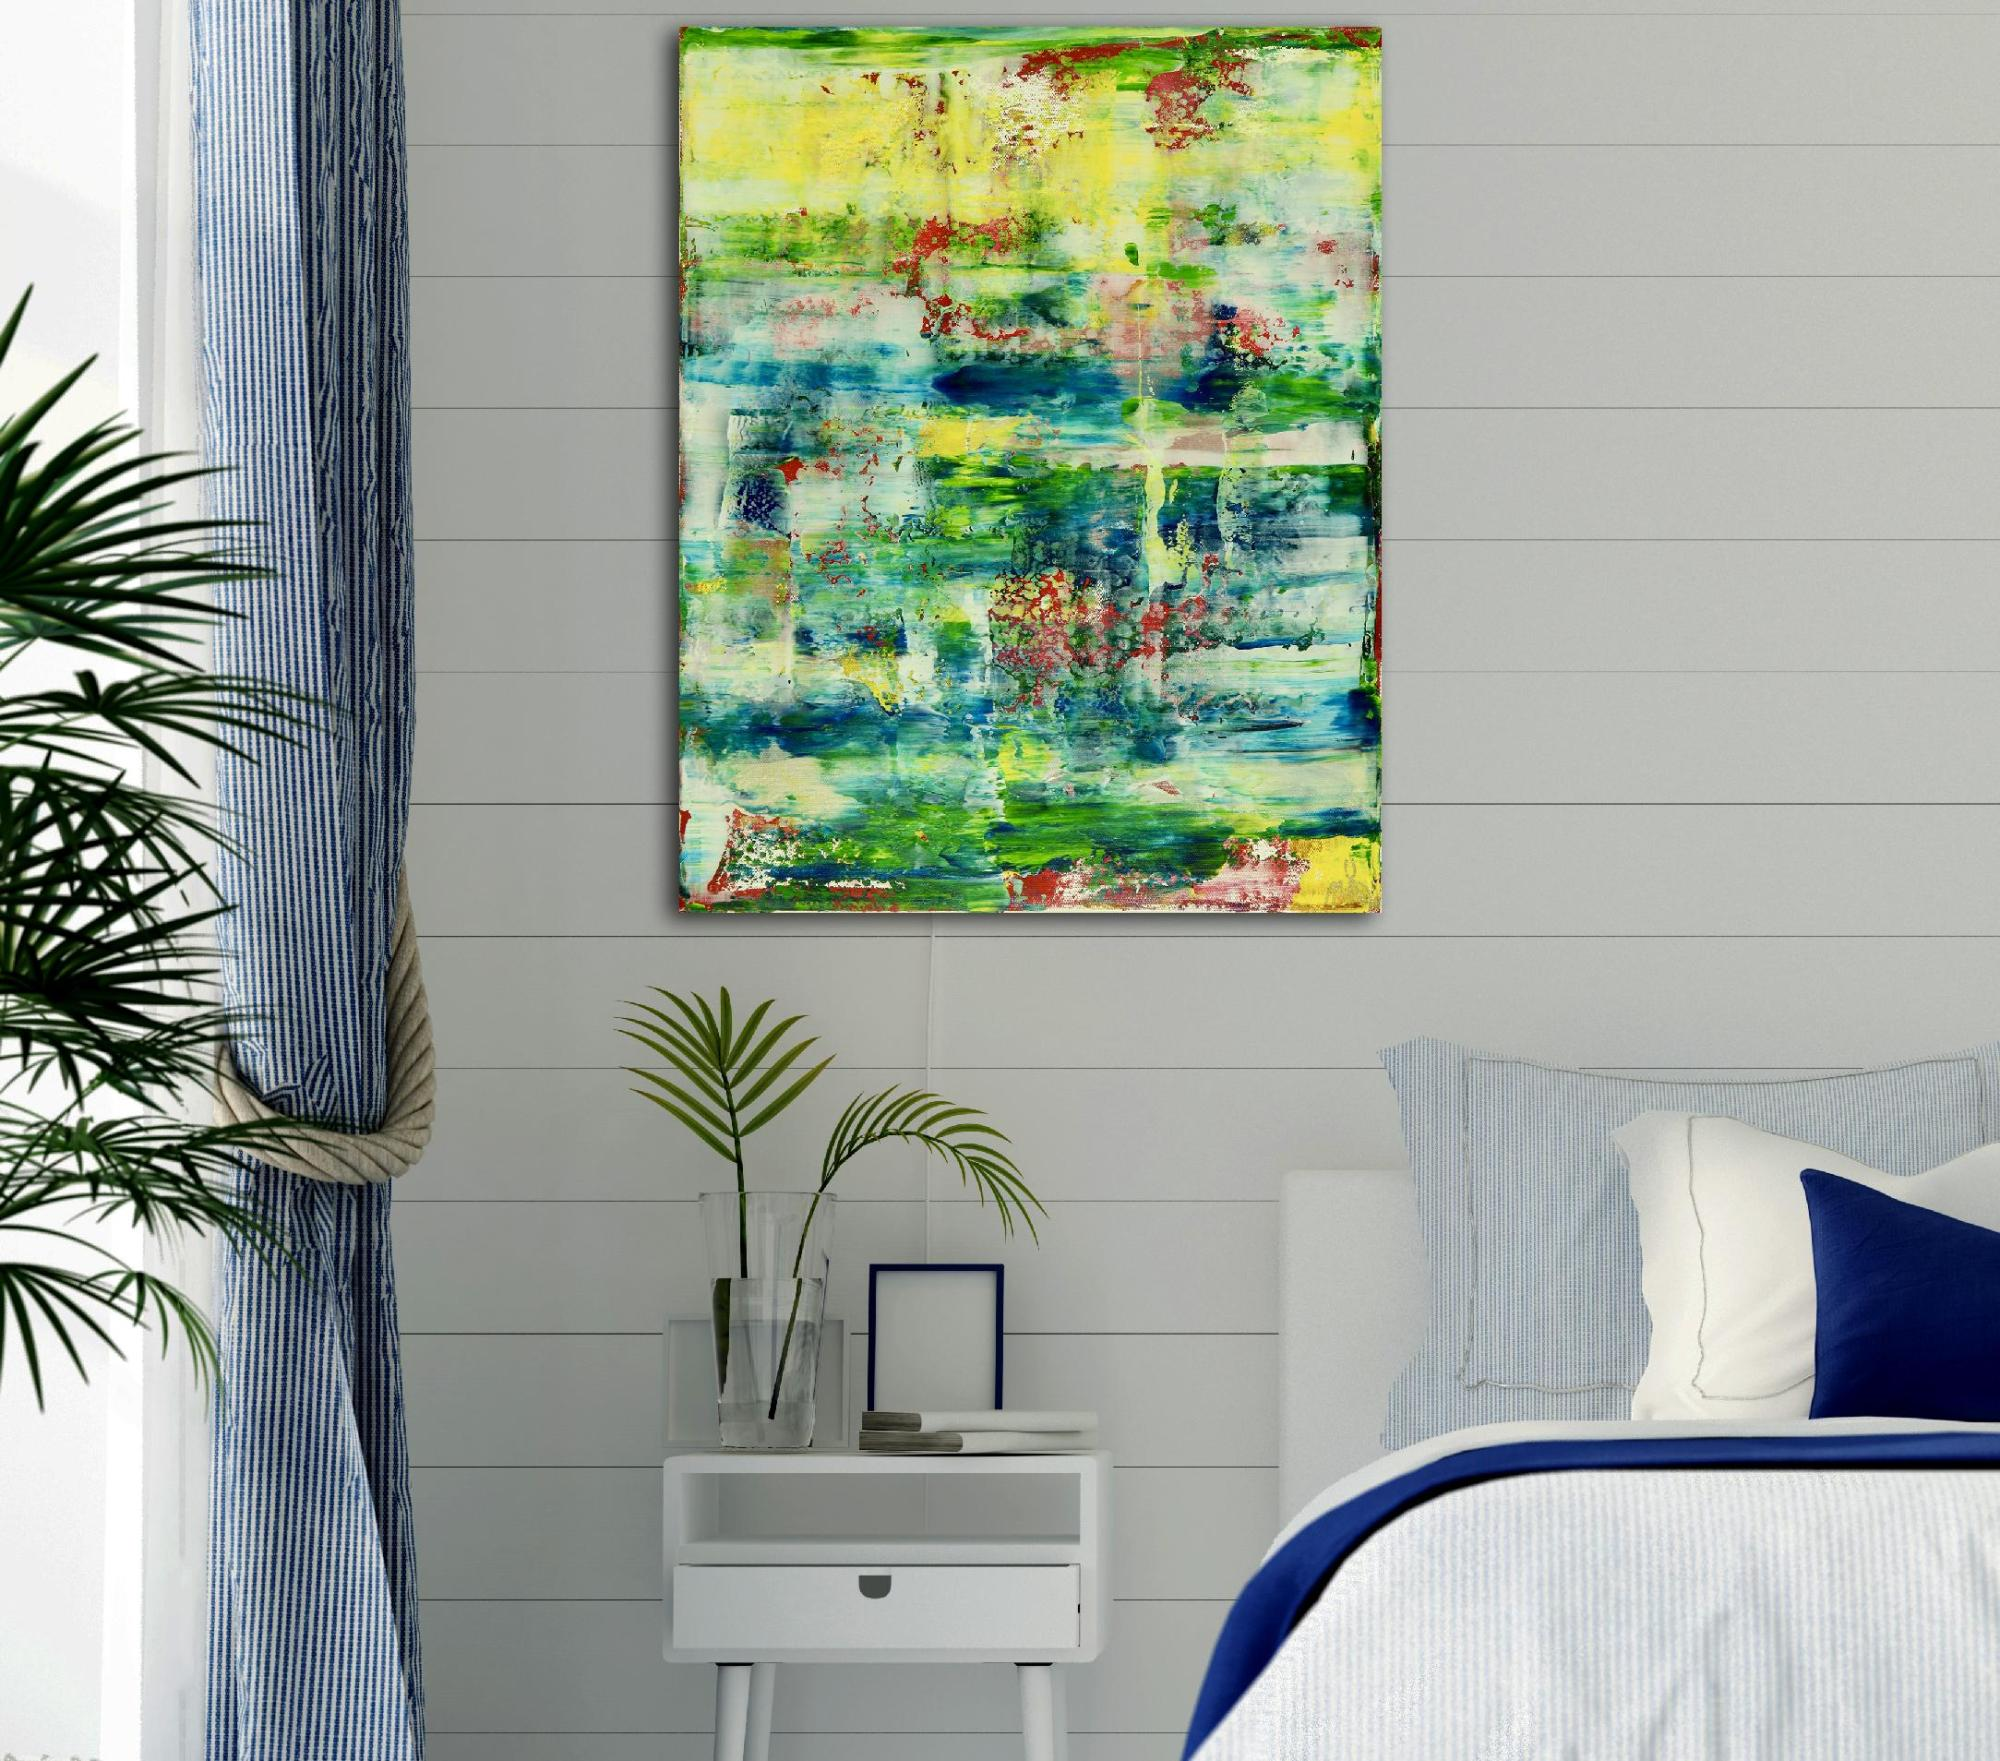 Room View - Sunny Morning Panorama 2 (2020) by Nestor Toro